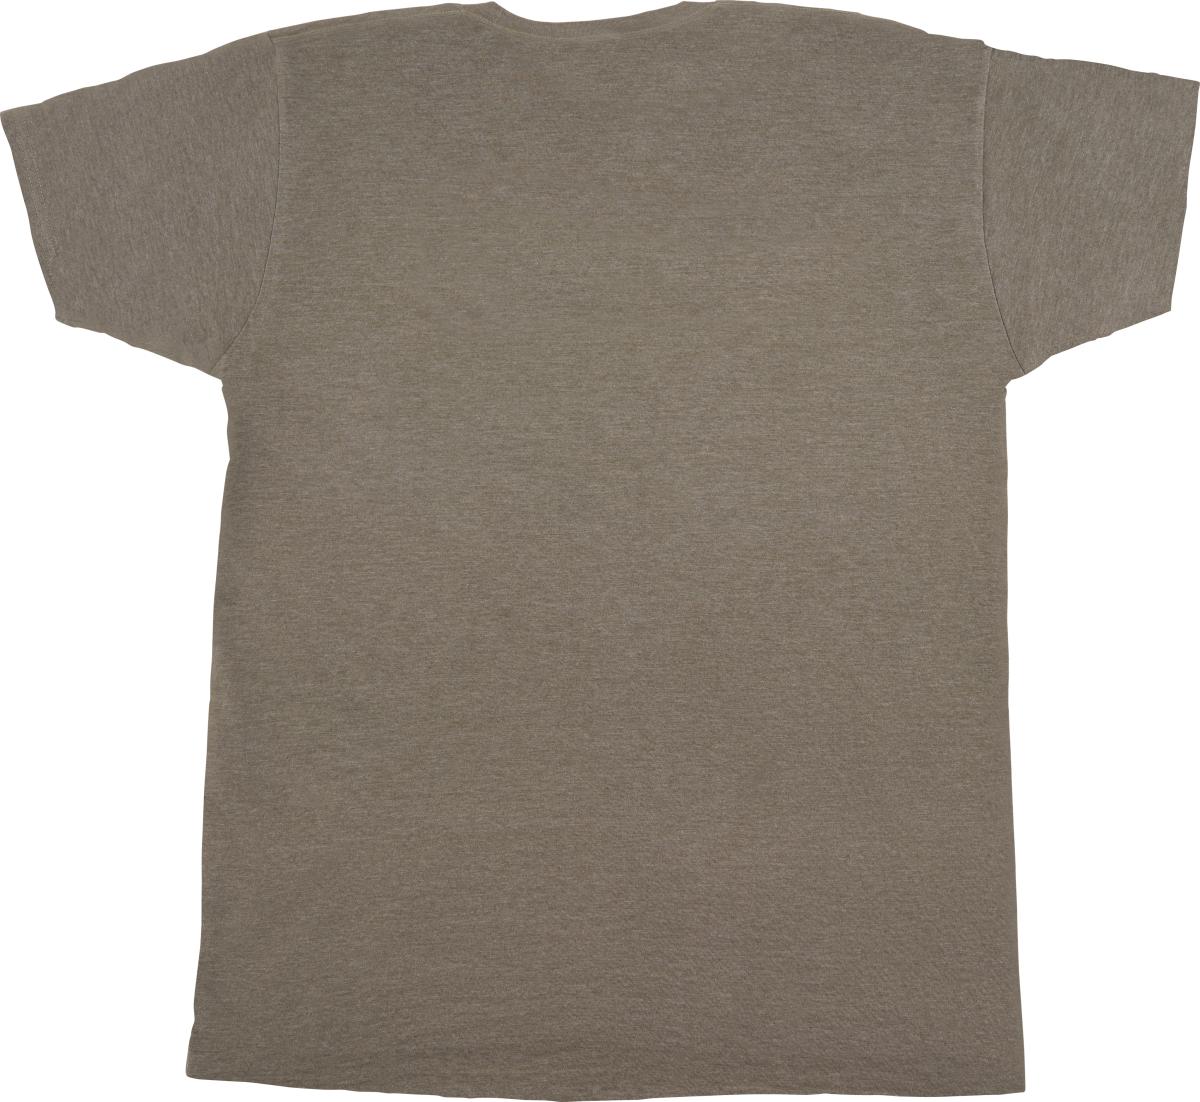 Charvel Charvel® Toothpaste Logo T-Shirt, Heather Green, XL